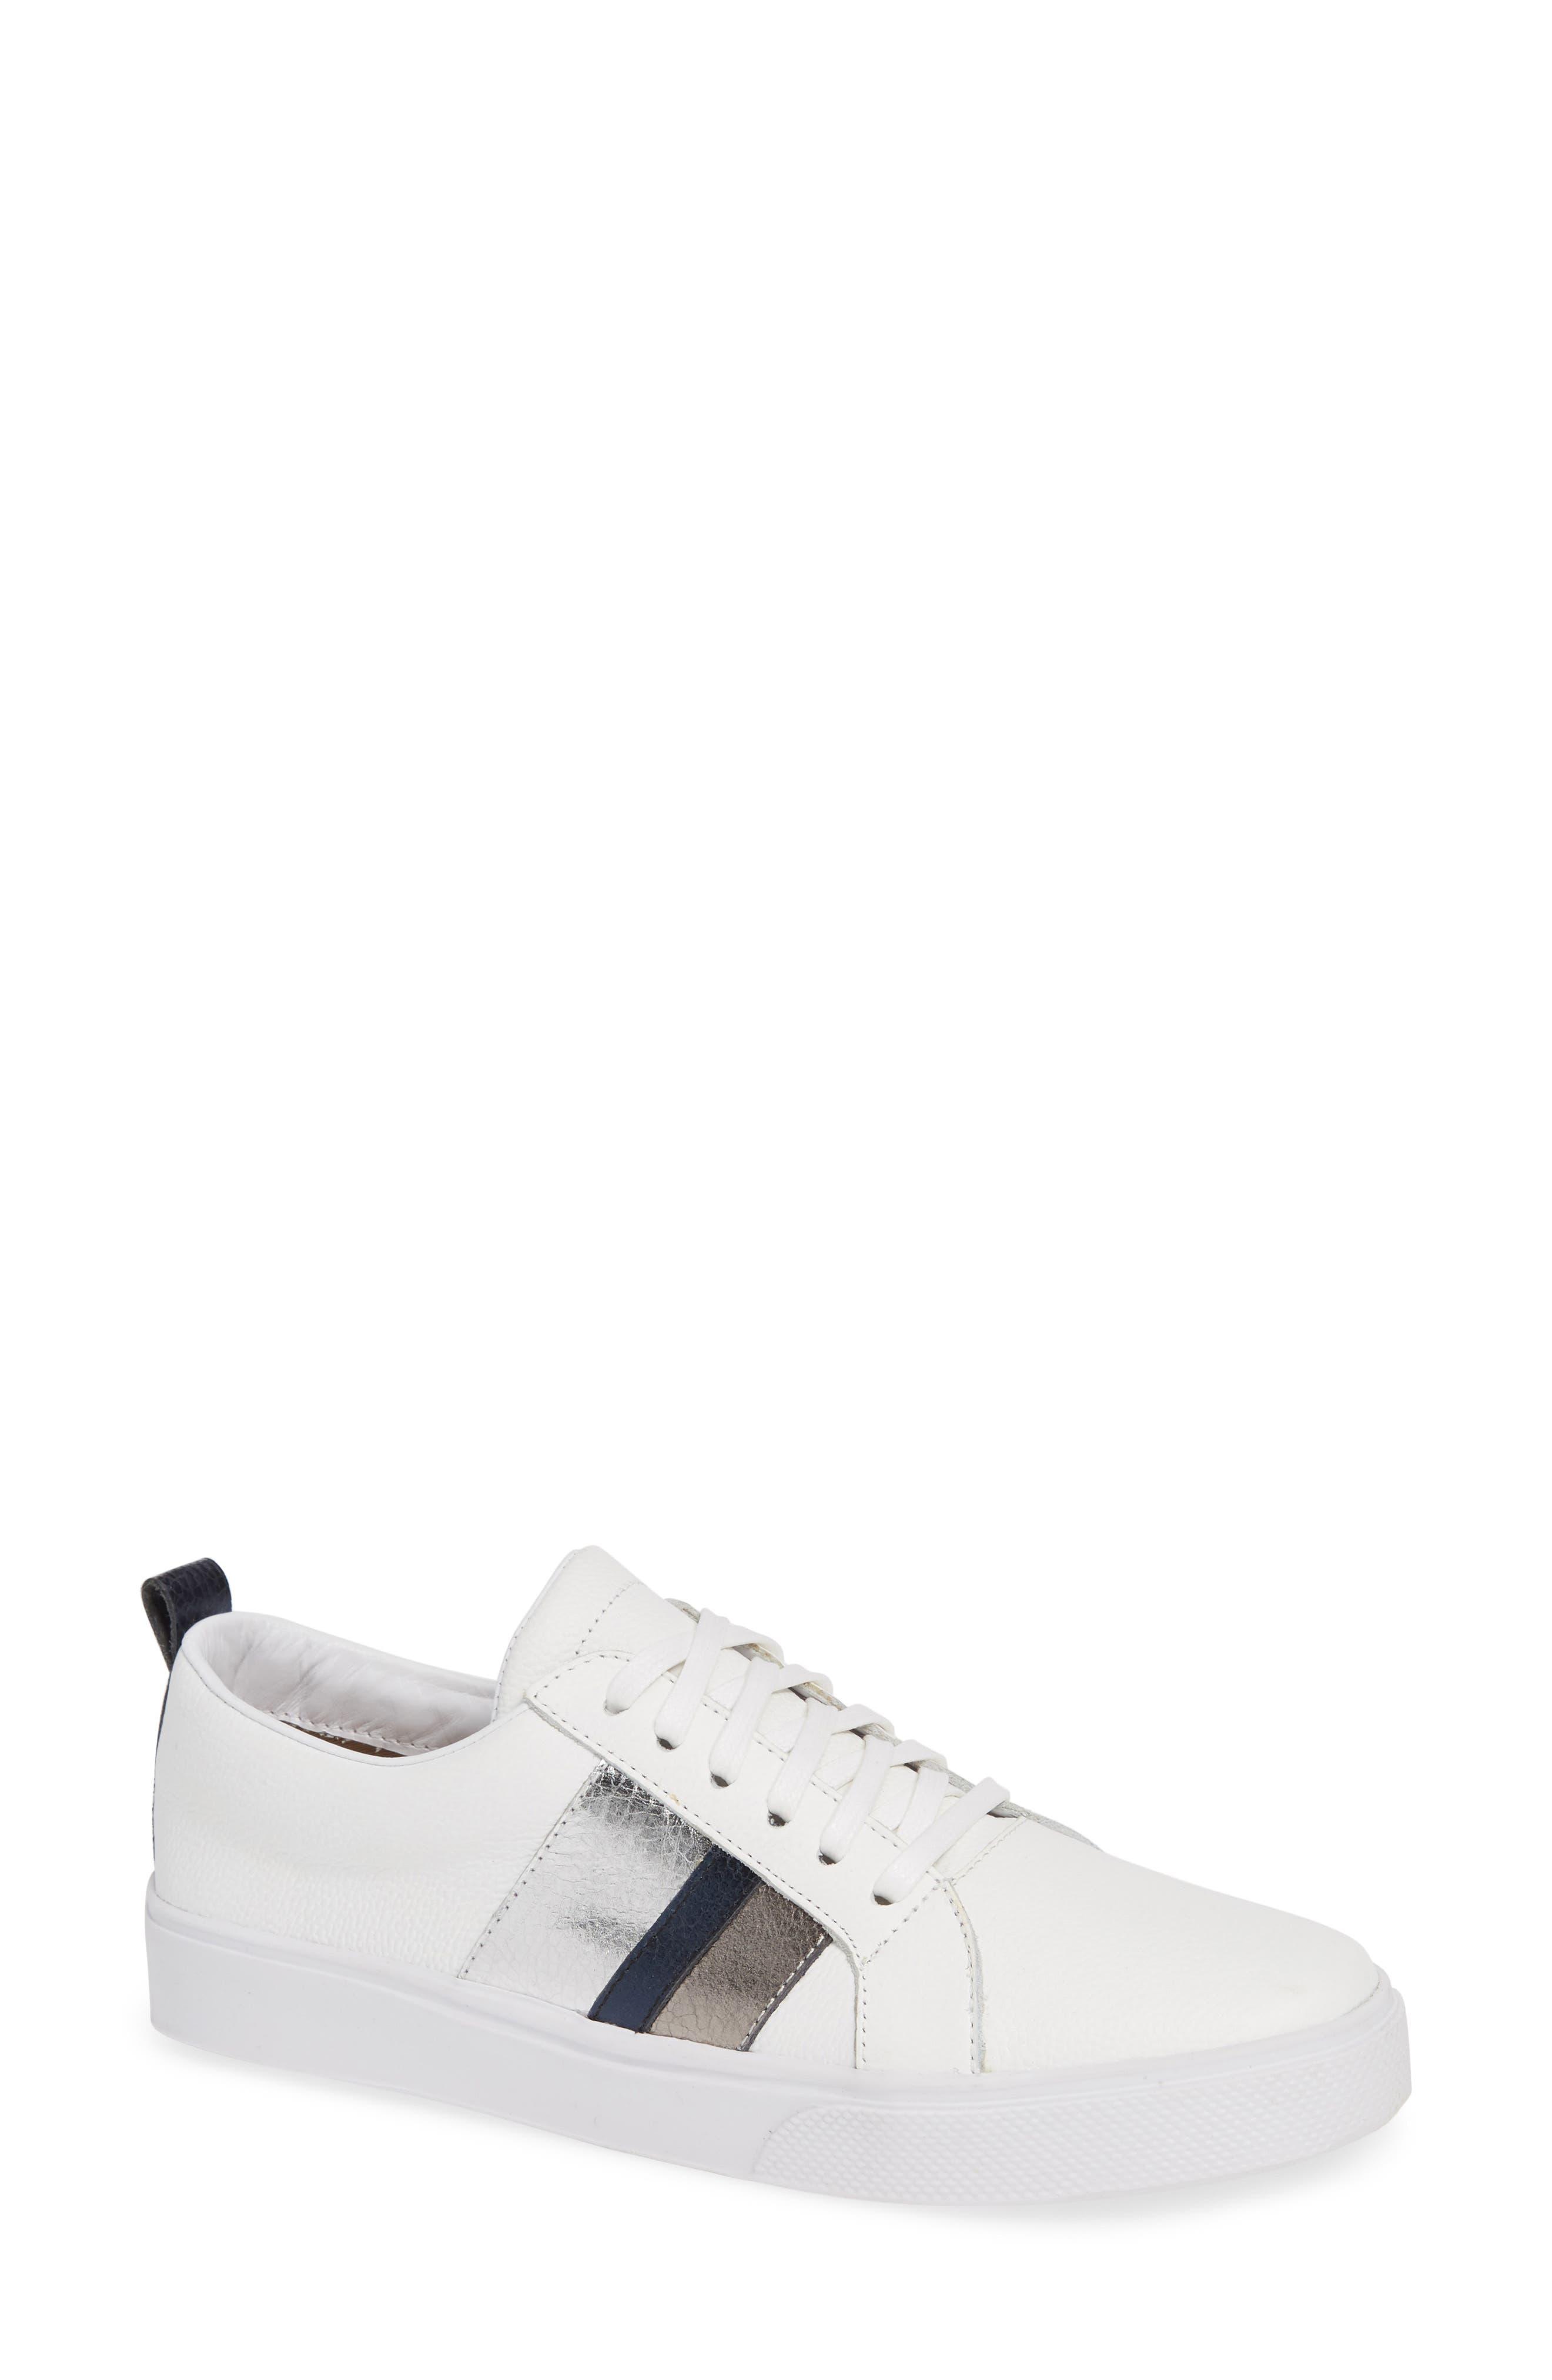 Bristol Sneaker,                             Main thumbnail 1, color,                             BLUE LEATHER